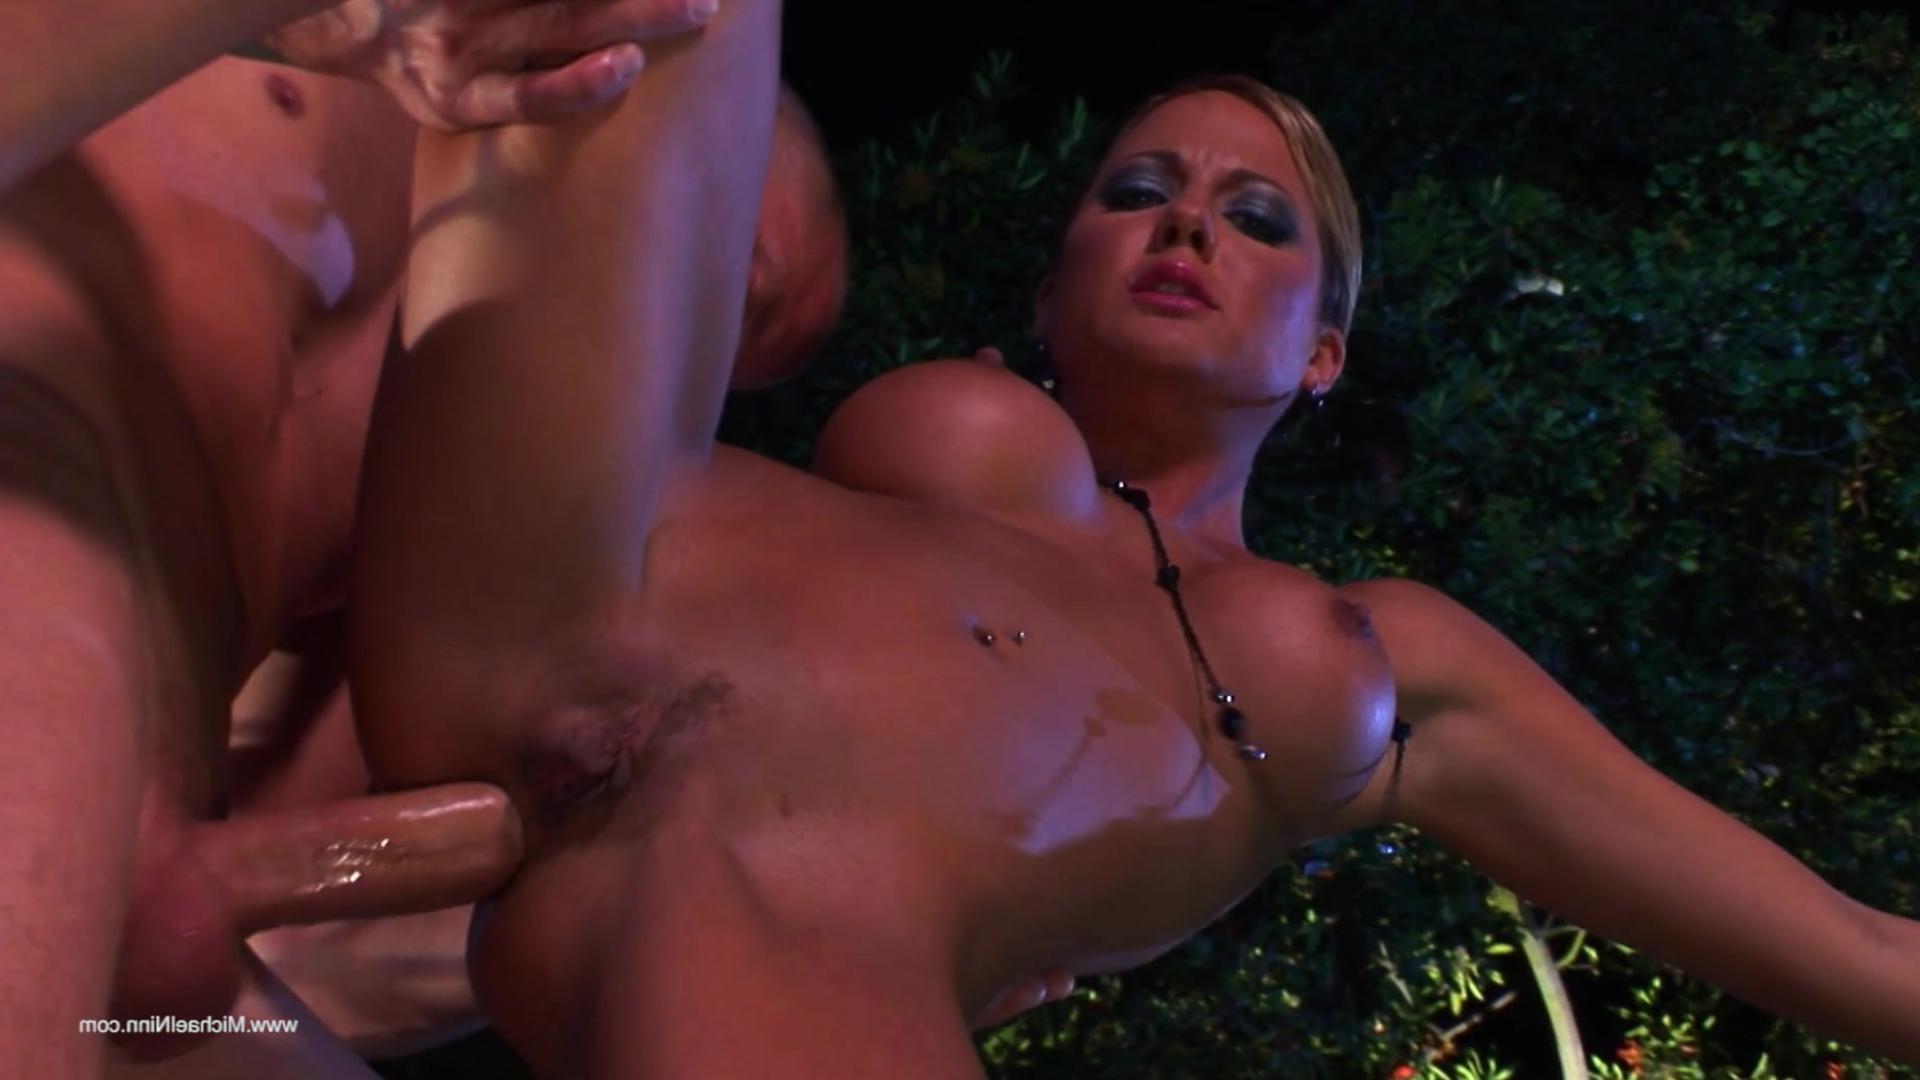 Порно кино груповуха в стриптиз баре фото 189-706